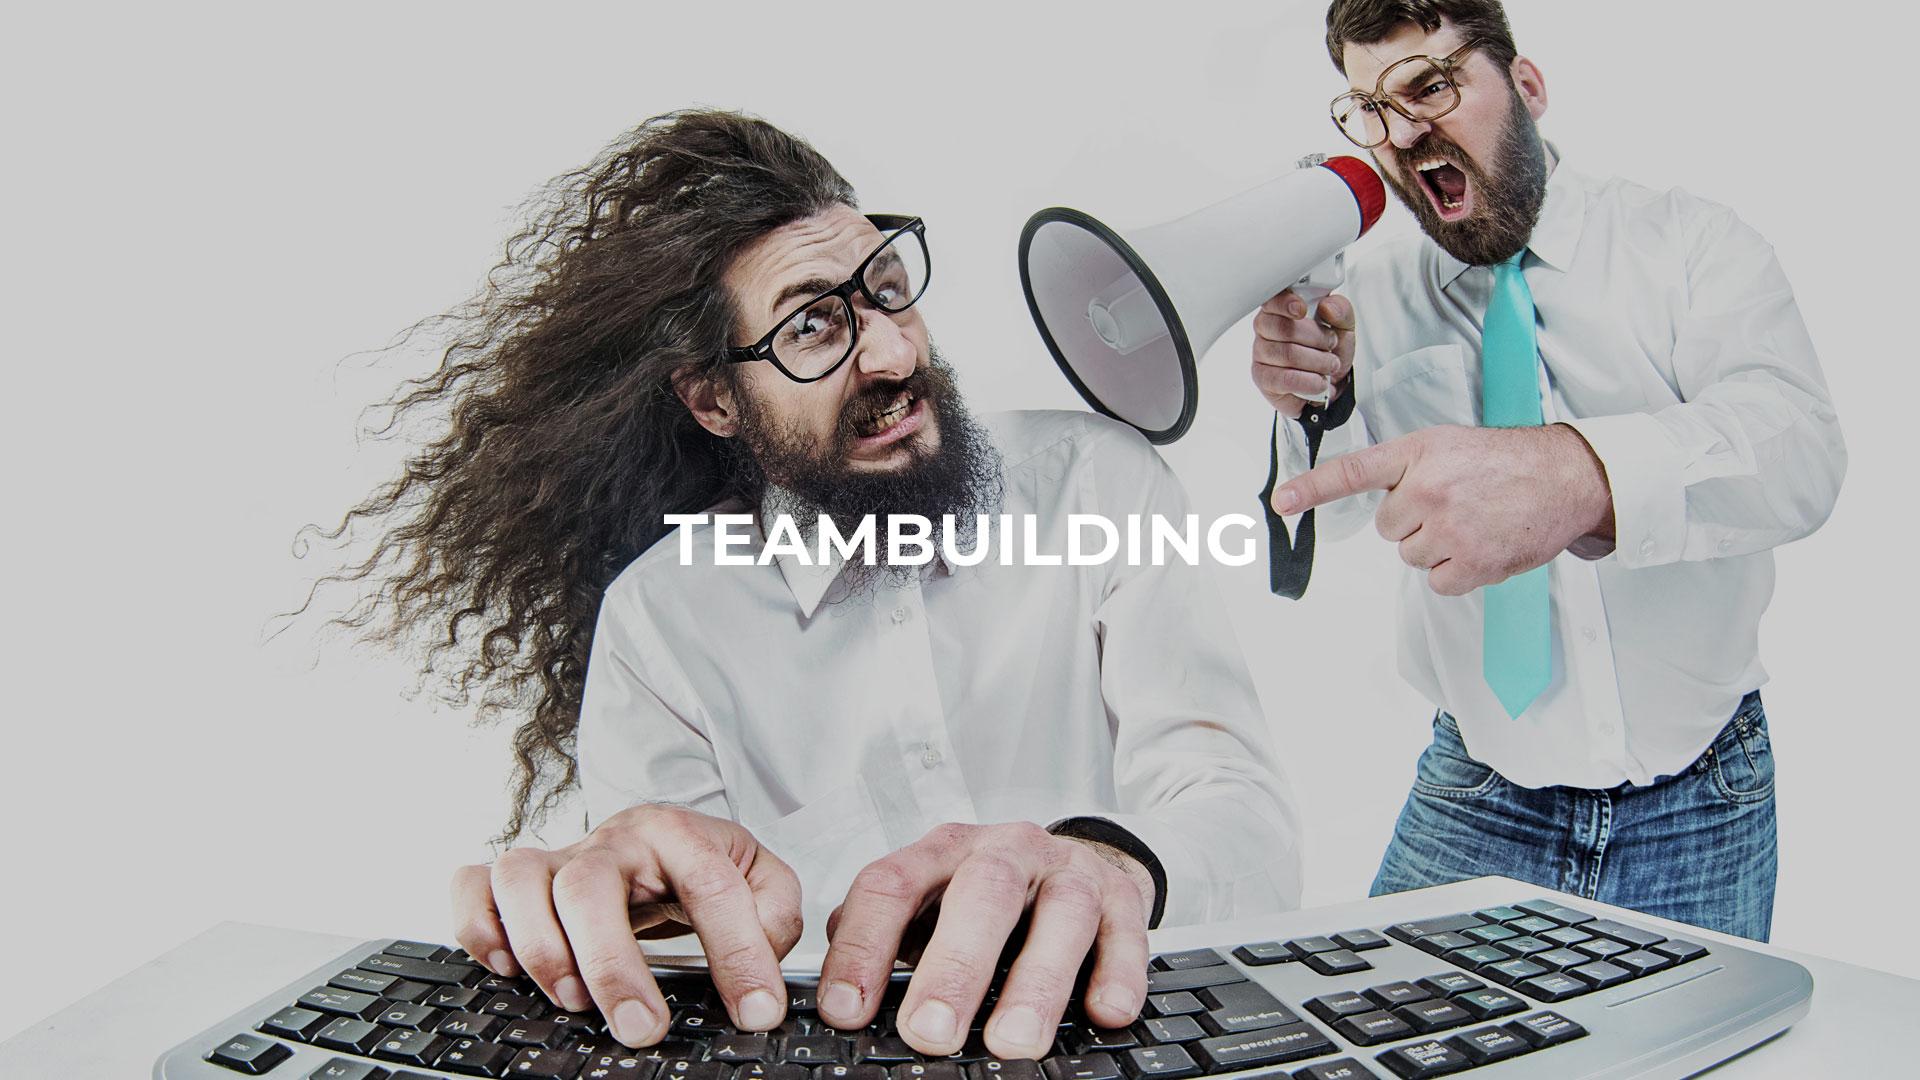 teambuilding-1